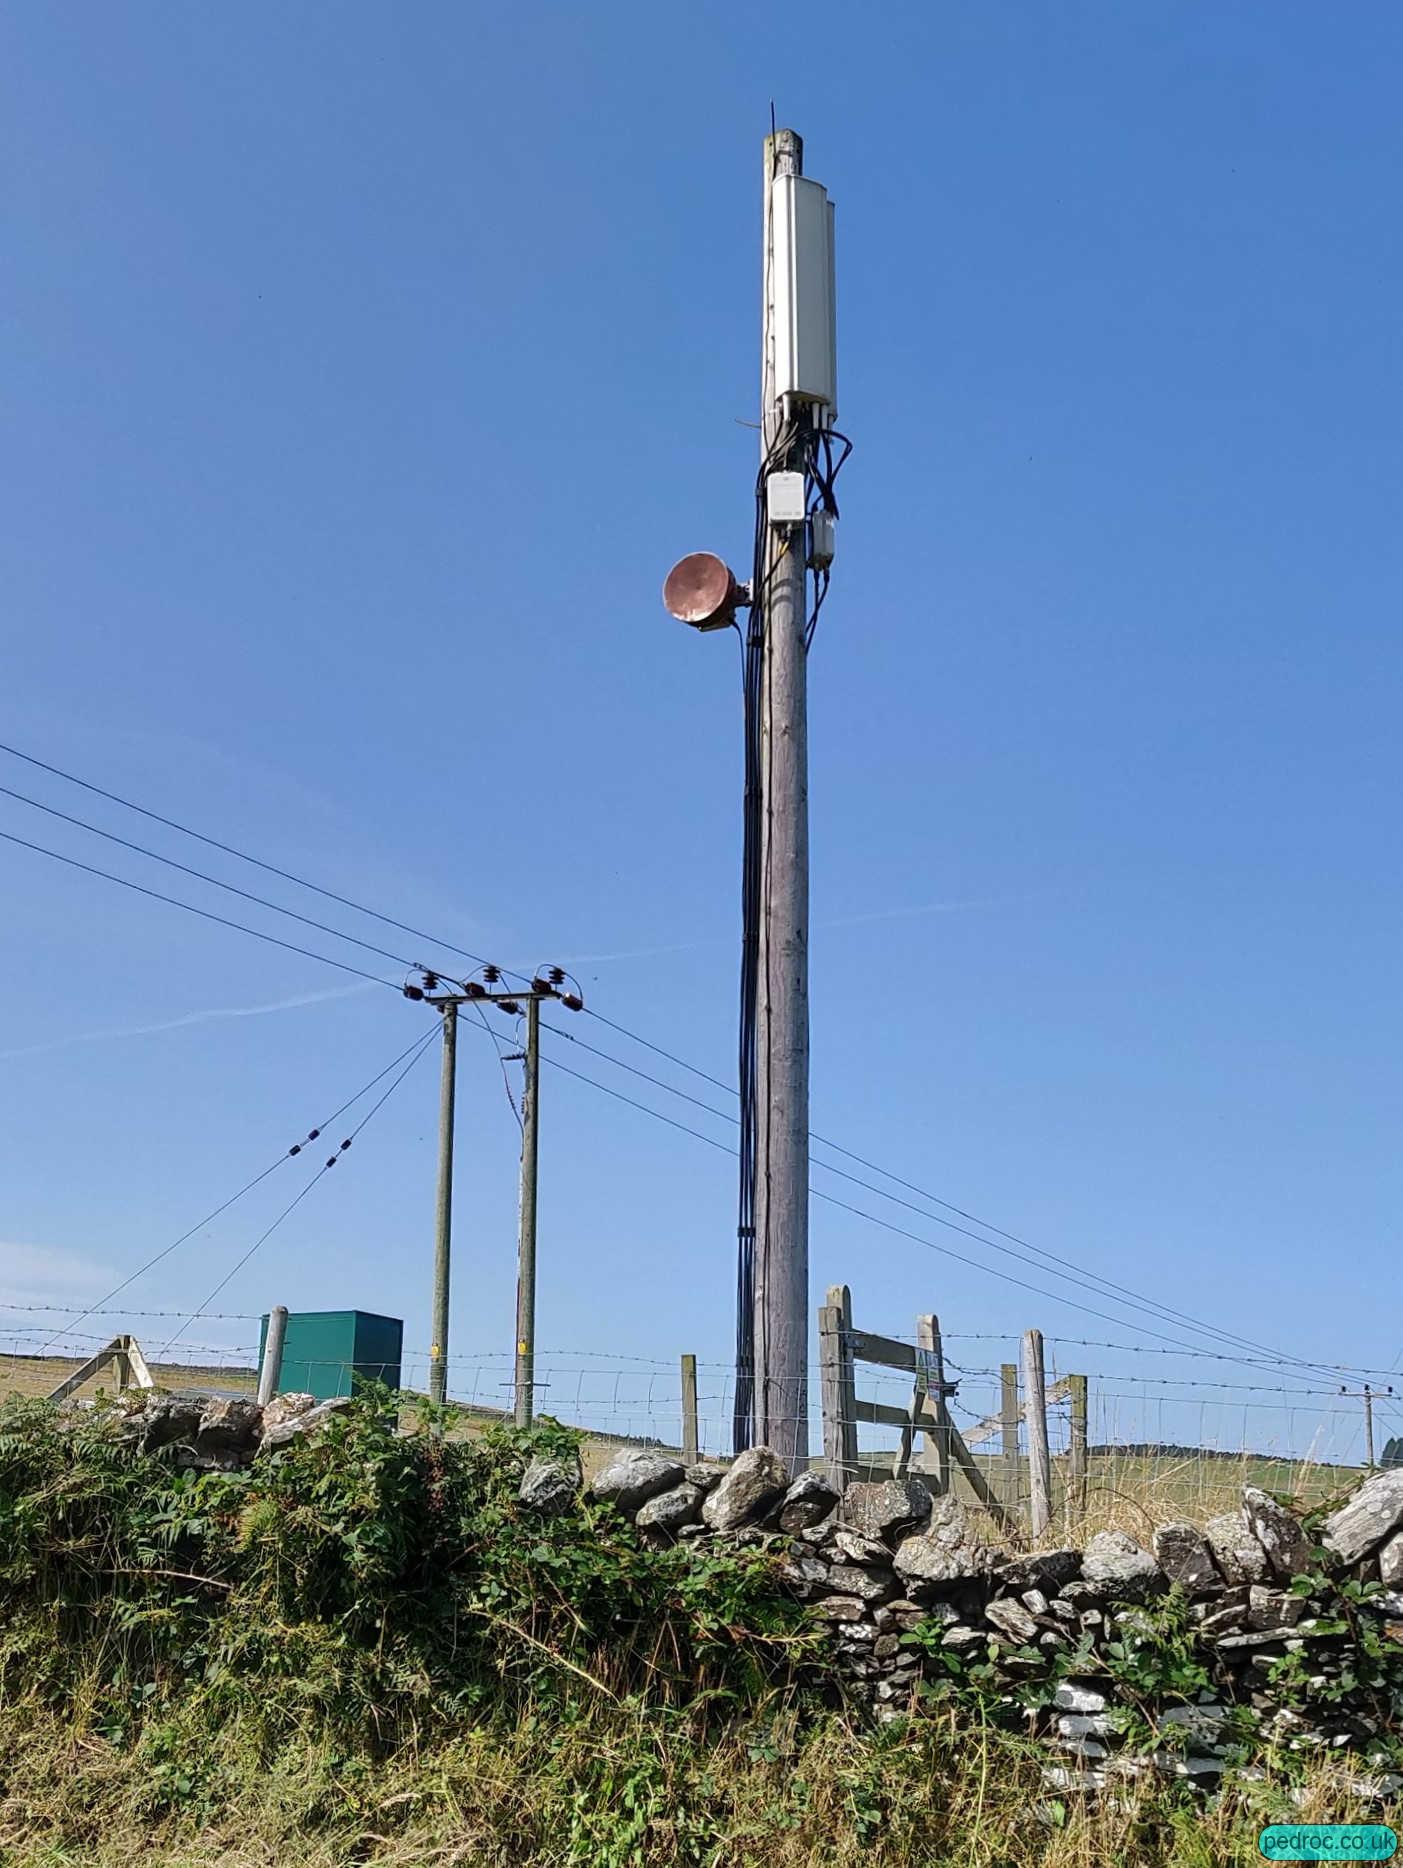 Sure's mast near Crosby.